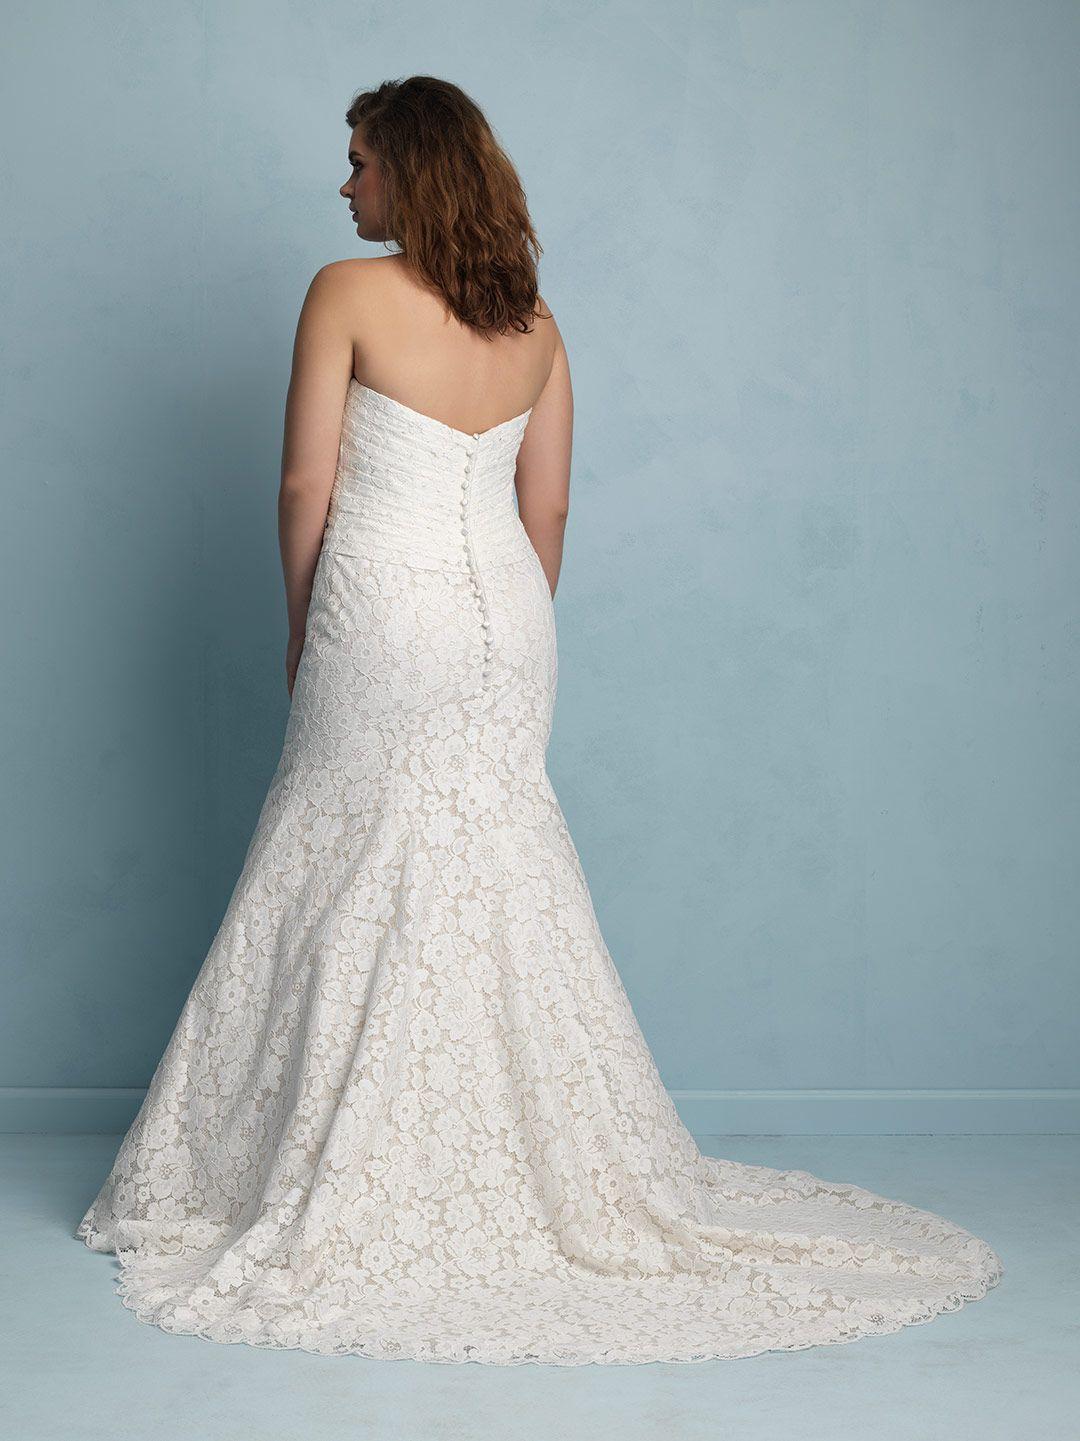 Allure Bridals: W354 | ALLURE W O M E N | Pinterest | Sleeve ...